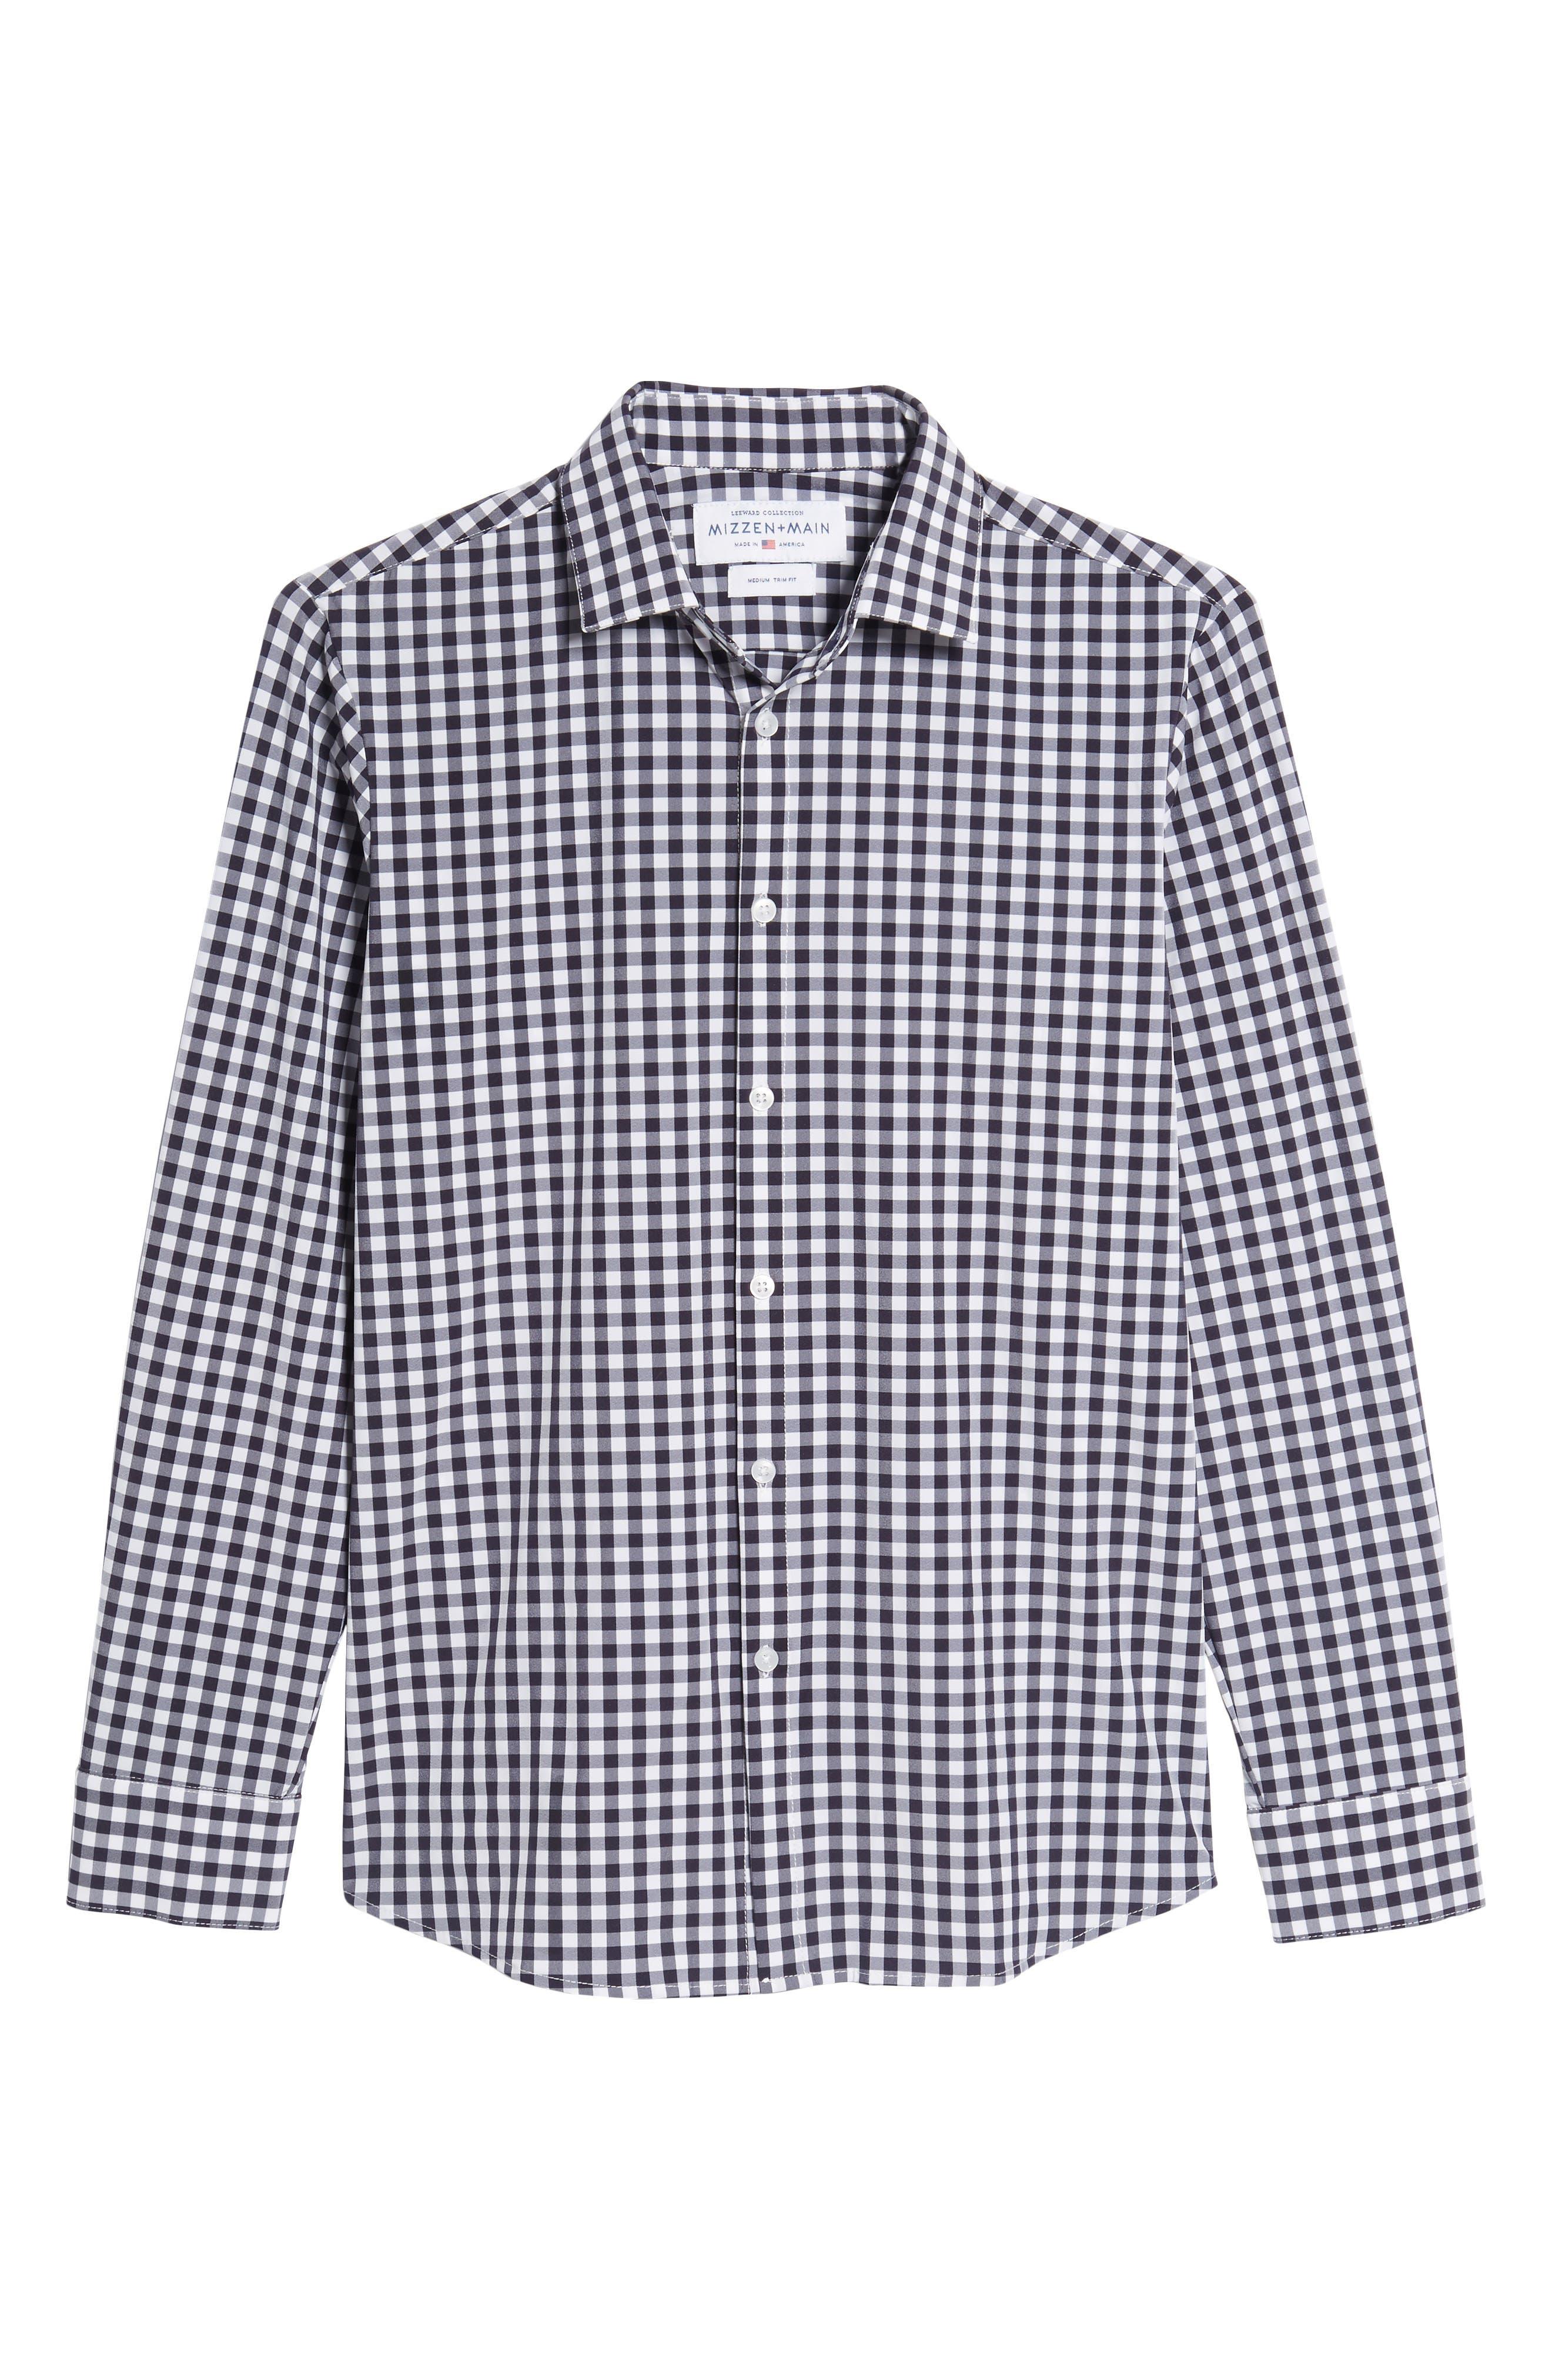 Montauk Slim Fit Gingham Performance Sport Shirt,                             Alternate thumbnail 6, color,                             Navy